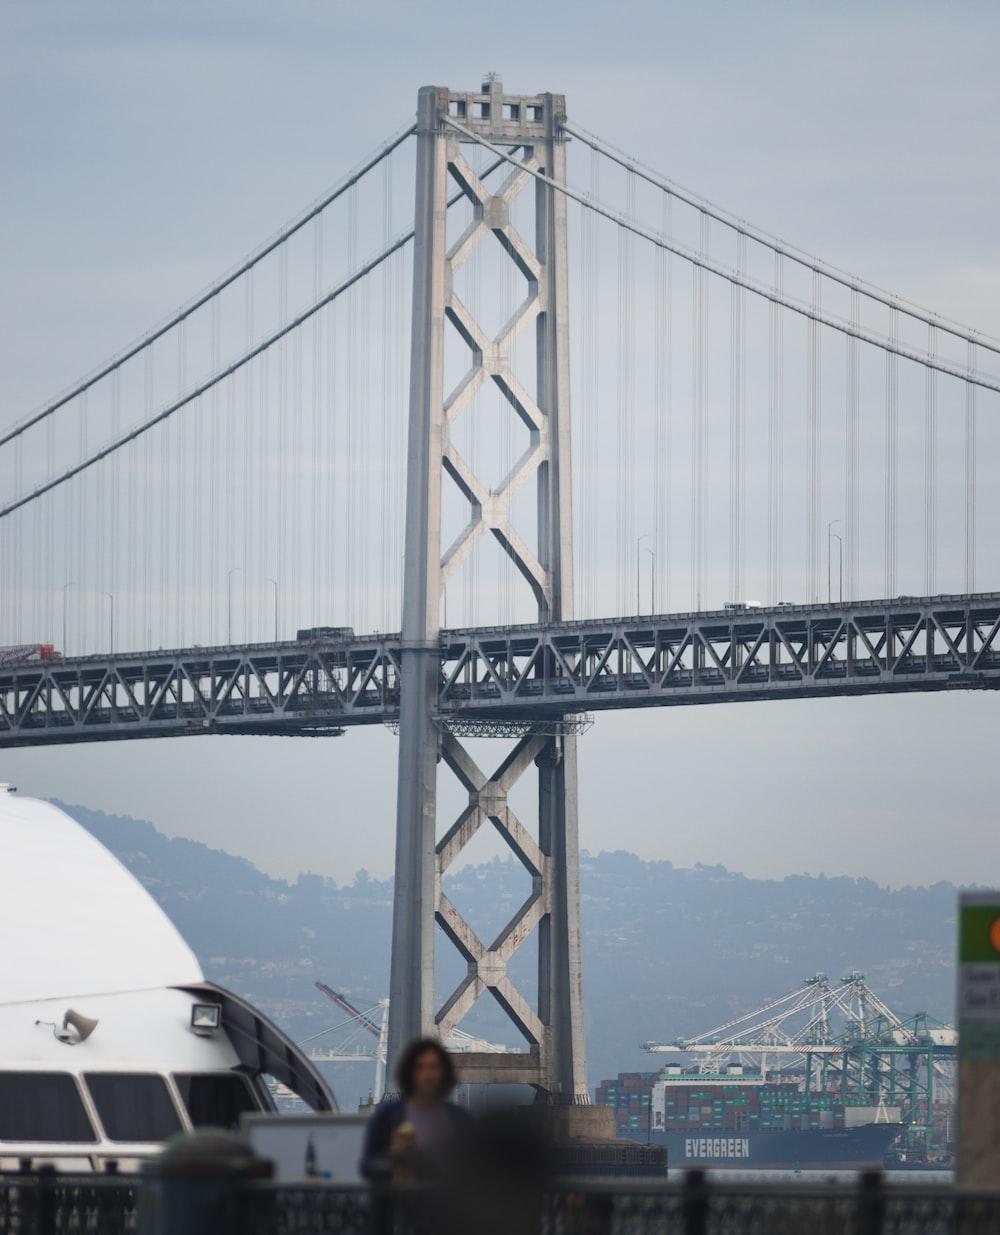 man in black jacket standing near golden gate bridge during daytime